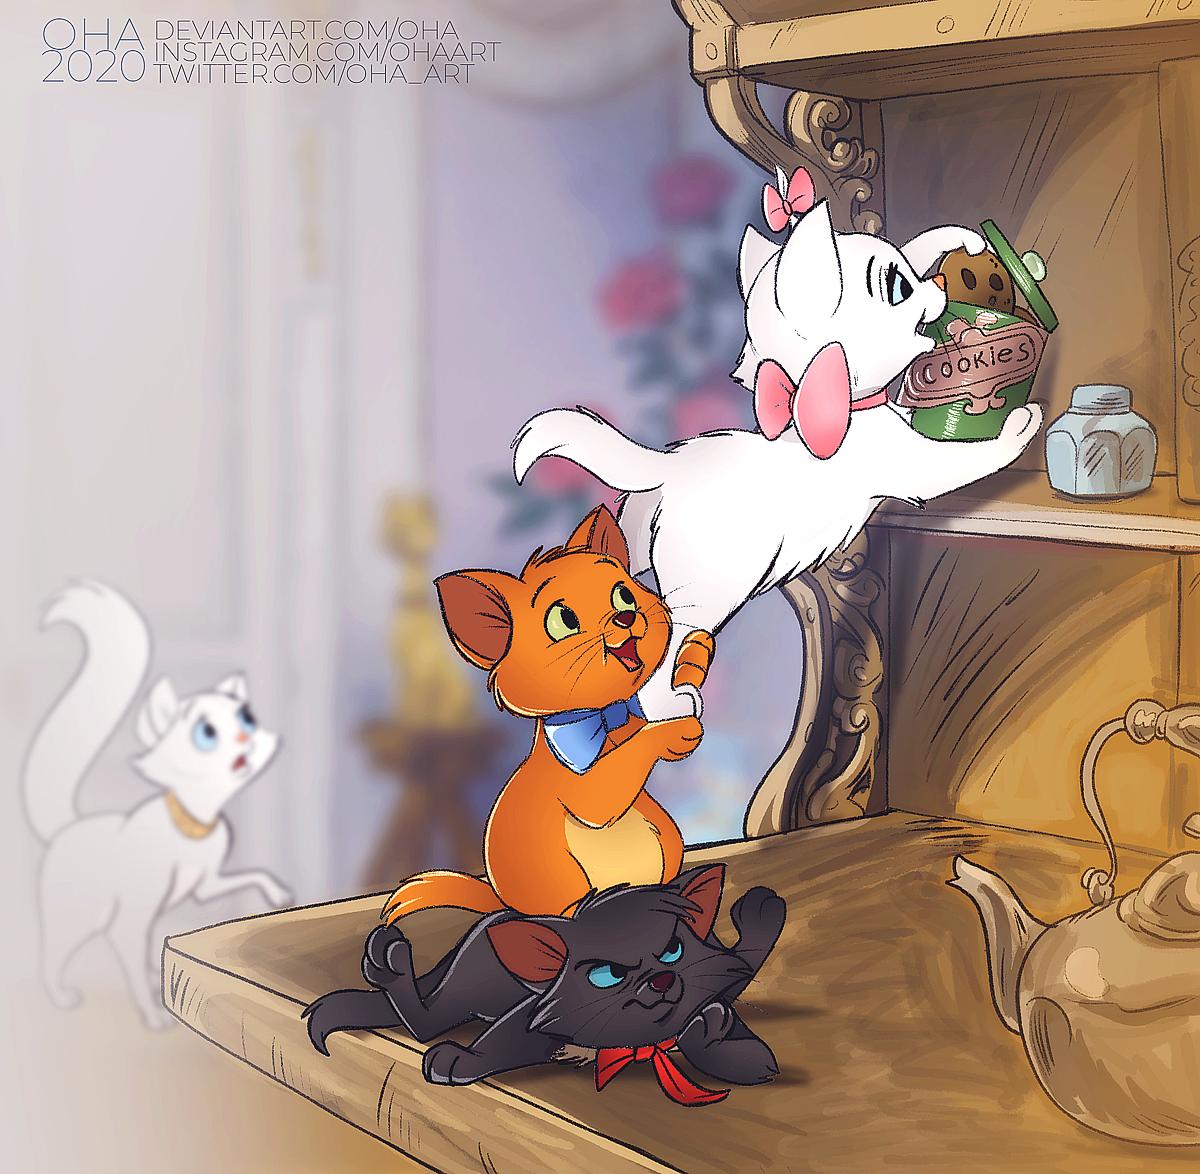 Kittens on quarantine